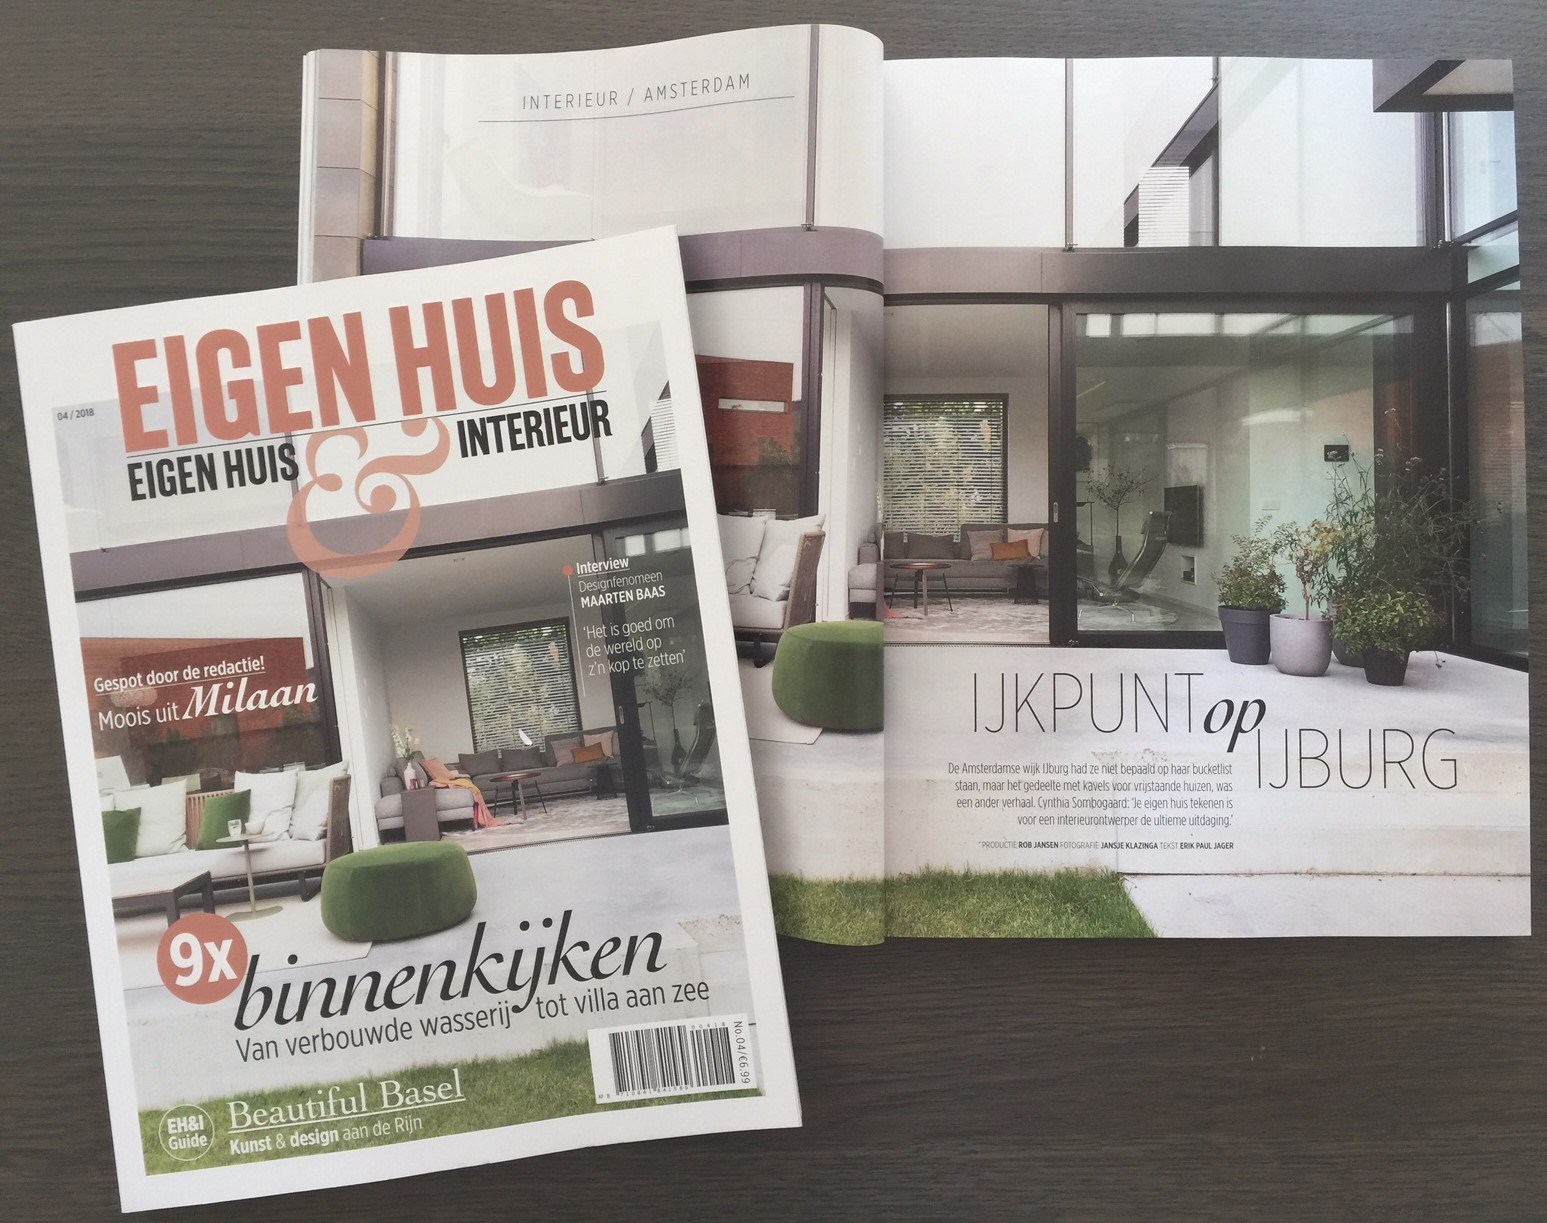 Villa CS op de cover magazine Eigen Huis & Interieur – Interior Design